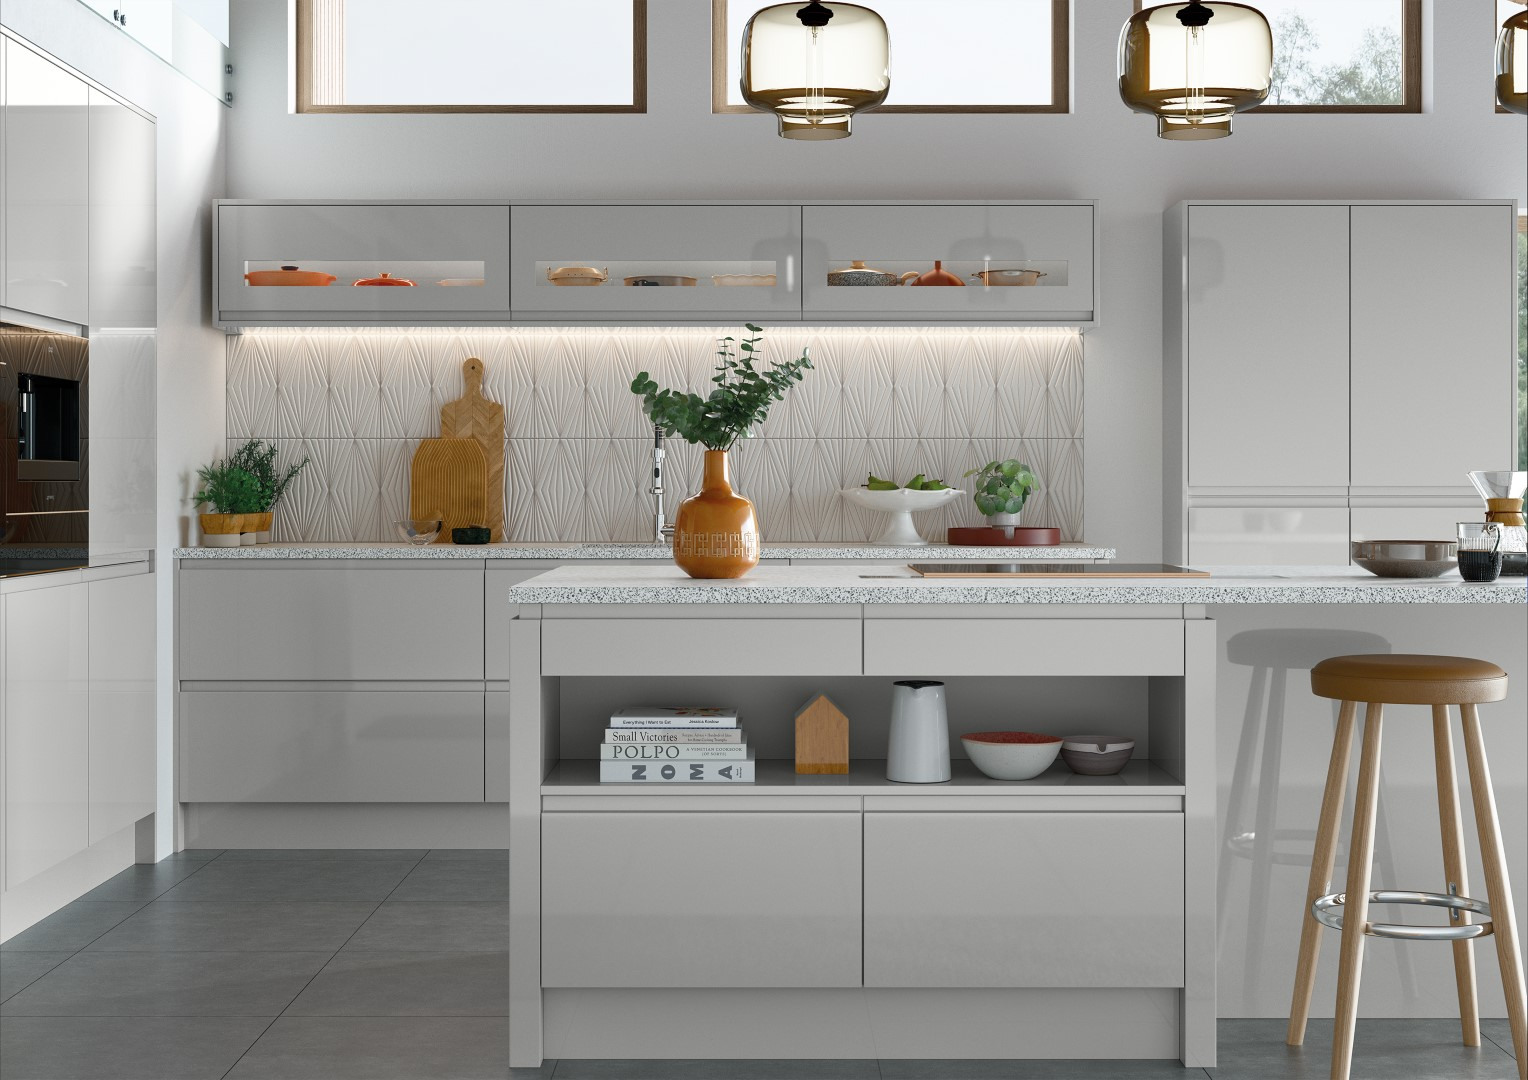 Strada Gloss Light Grey - Kitchen Design - Alan Kelly Kitchens - Waterford - 1